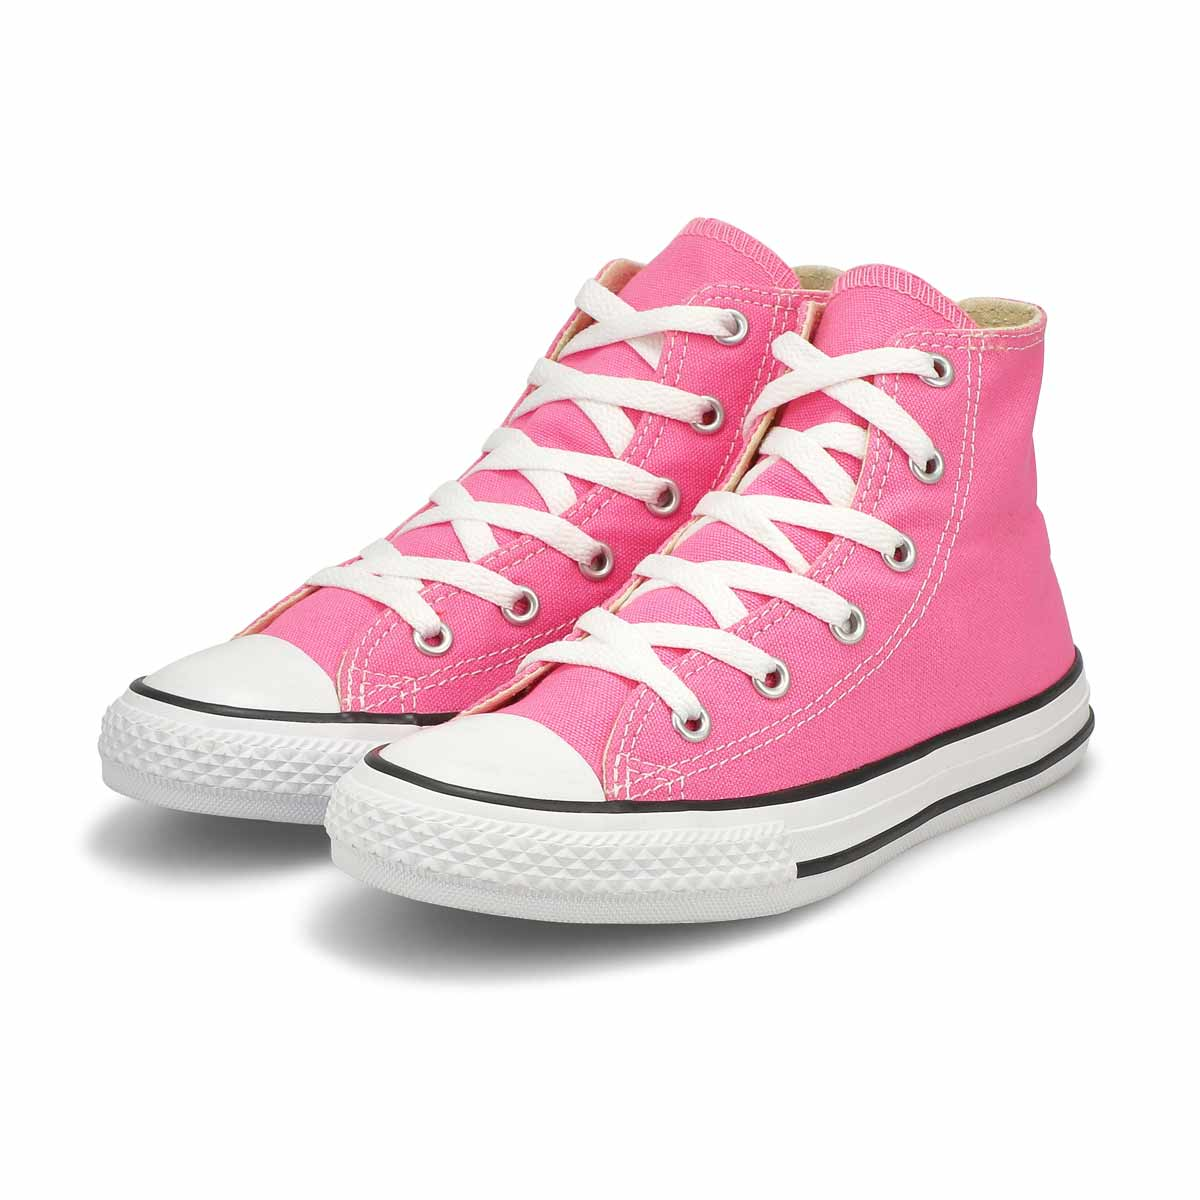 Grls CTAS Core pink high top sneaker